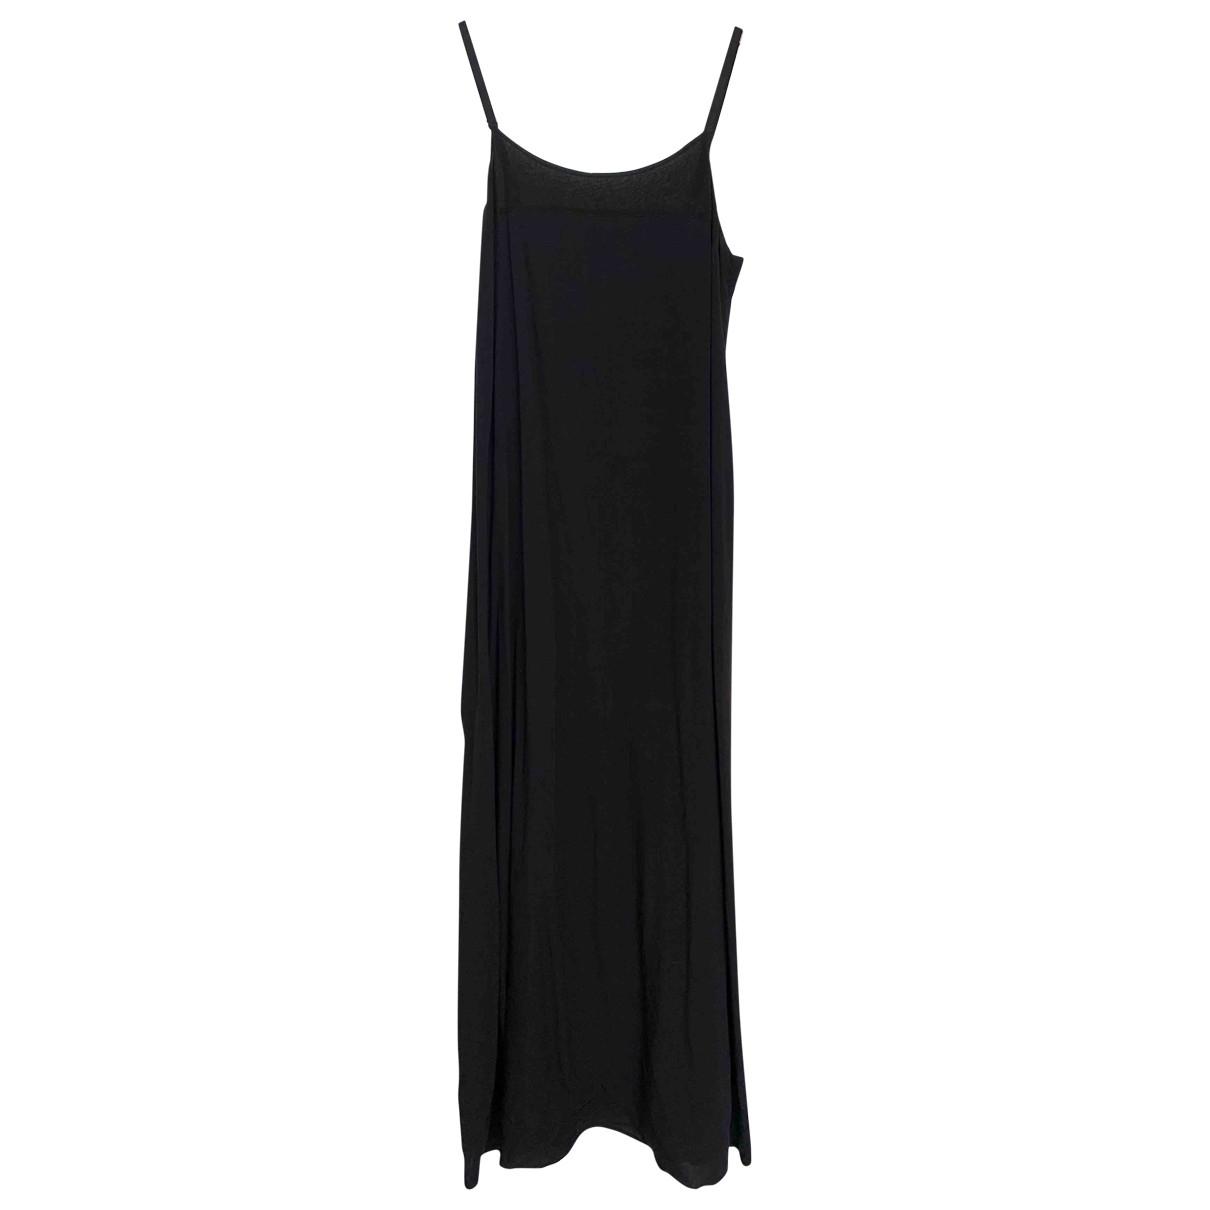 Ag Adriano Goldschmied \N Black dress for Women M International